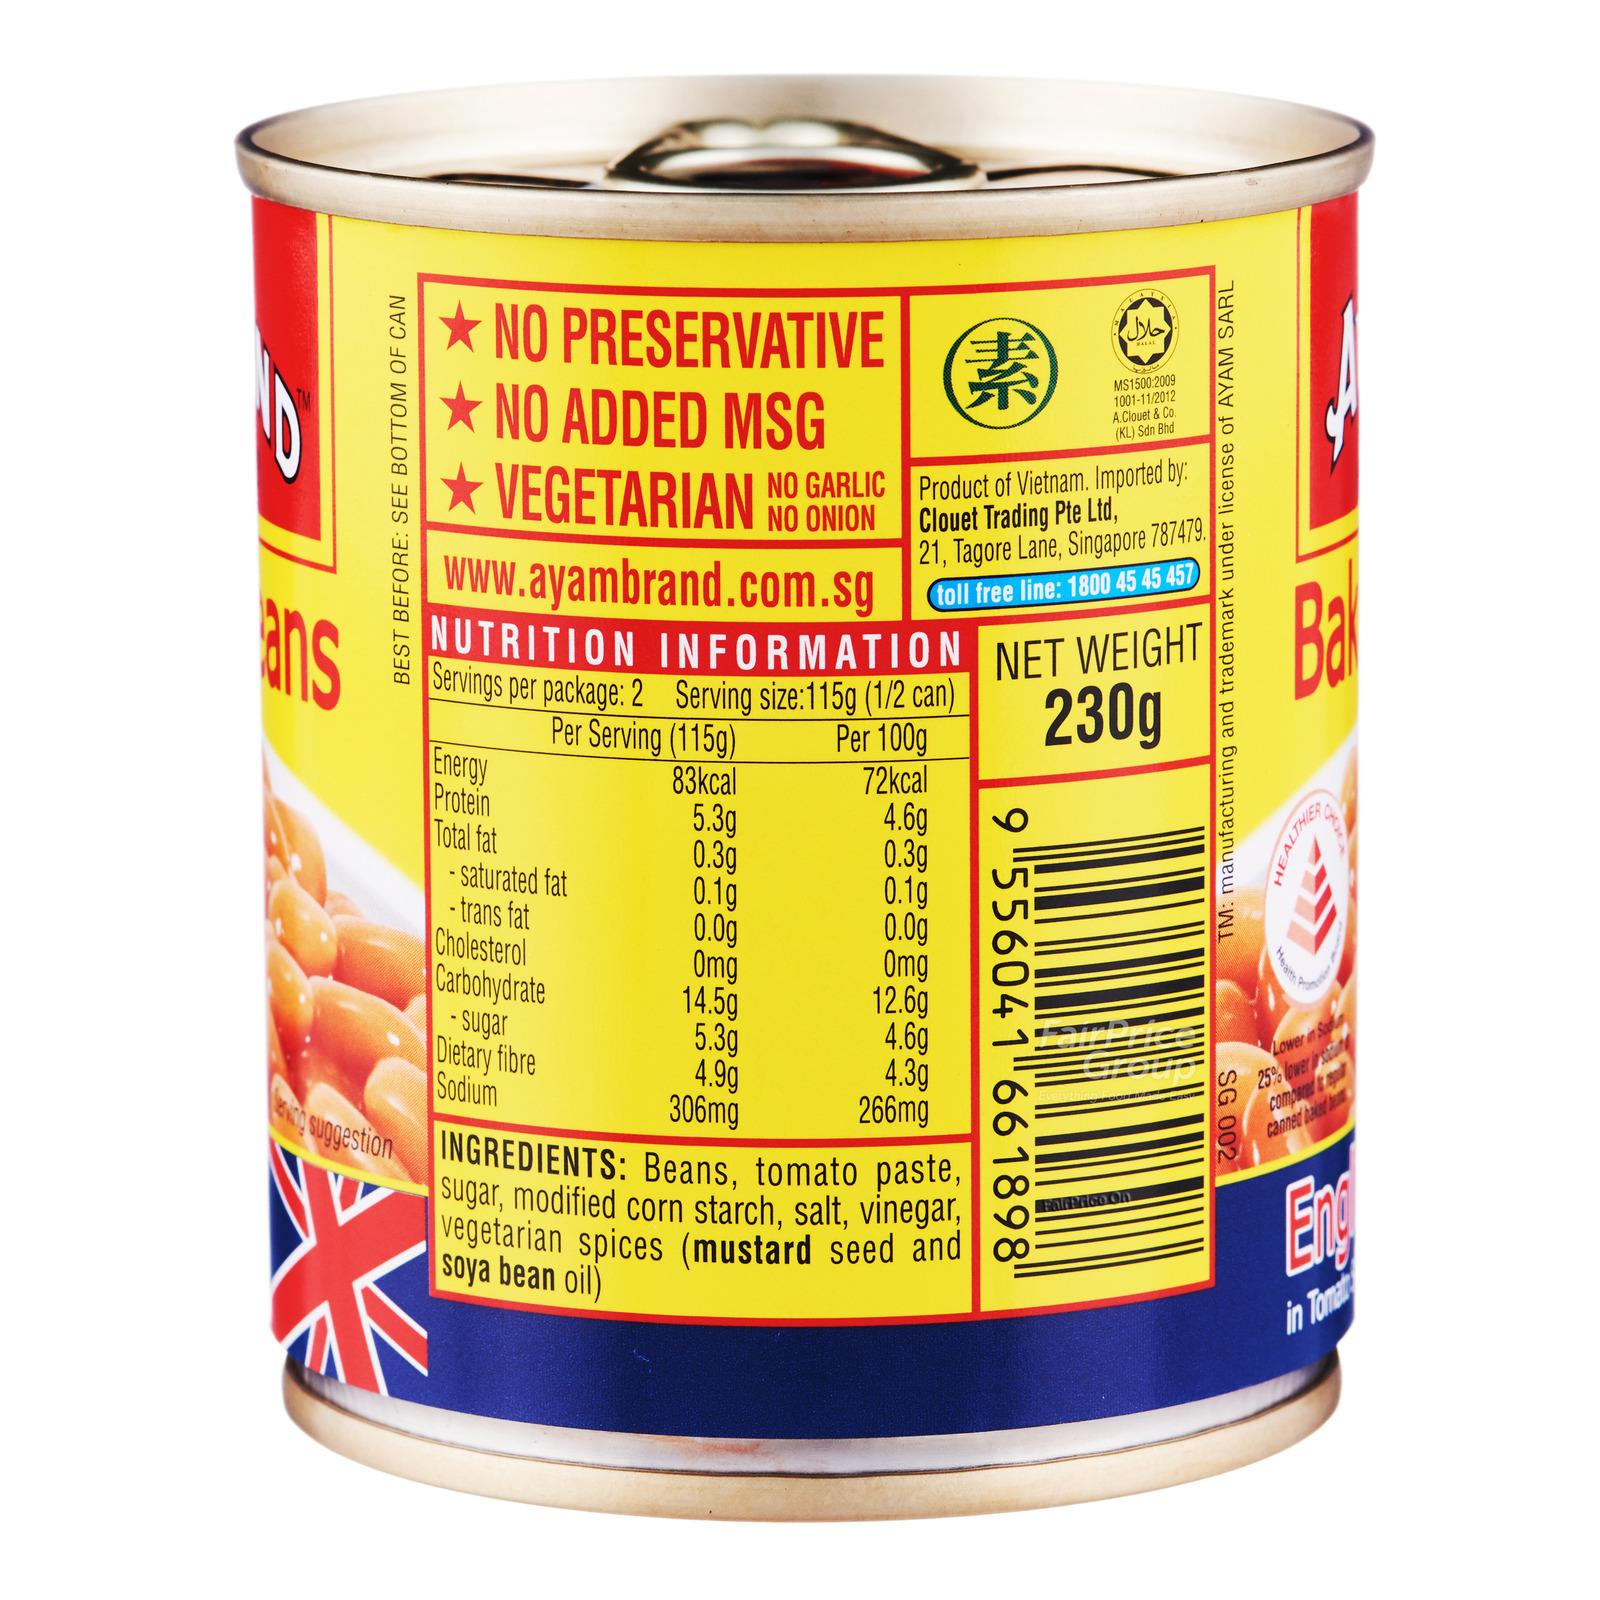 Ayam Brand Baked Beans English Recipe Tomato Sauce Ntuc Fairprice